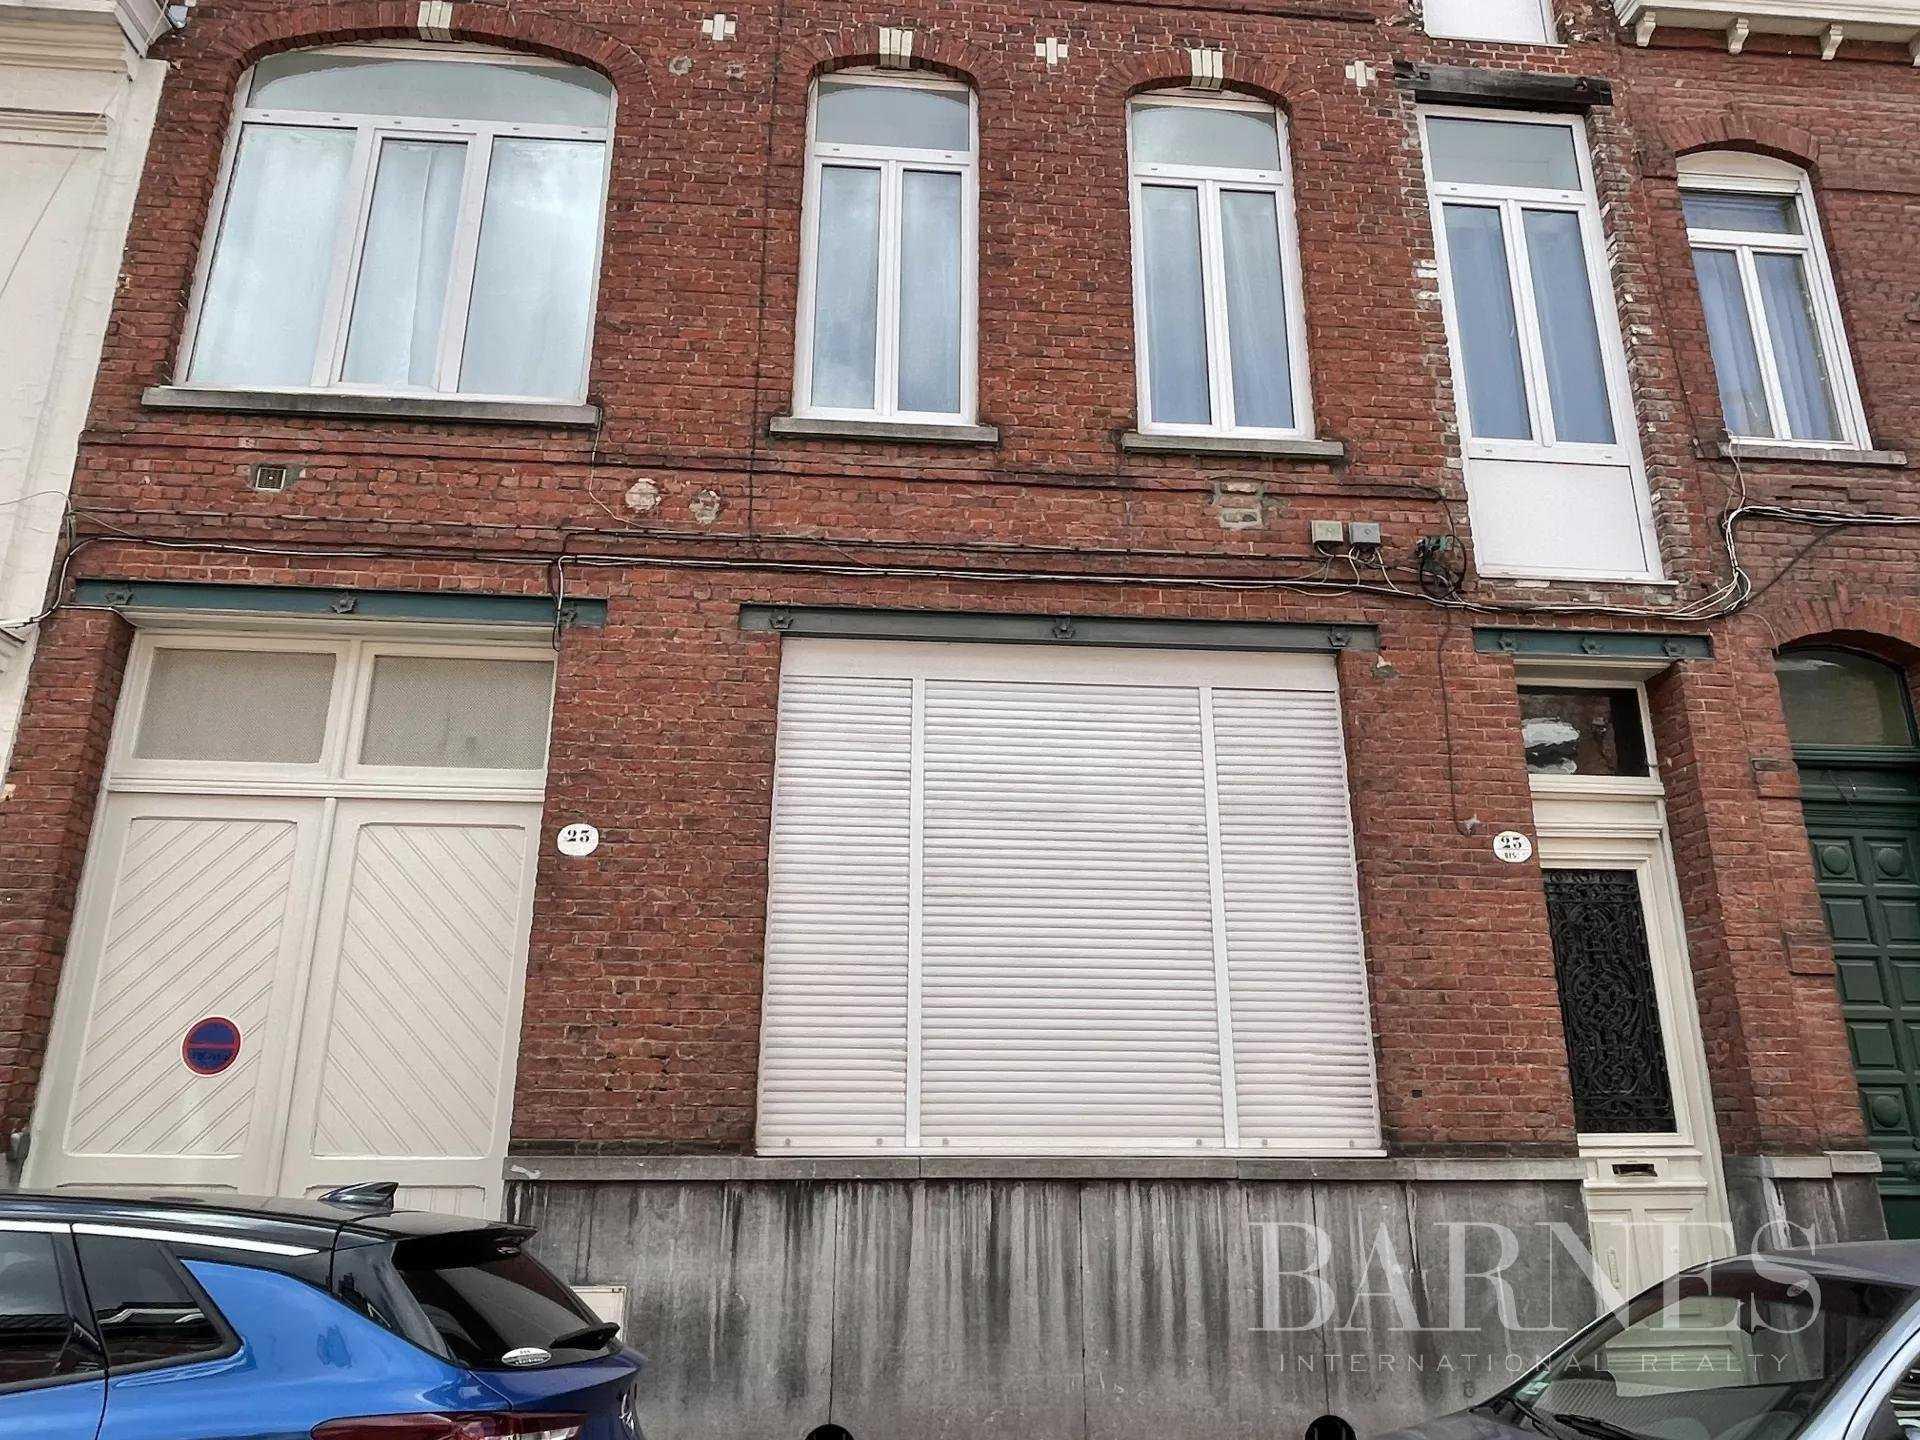 Tourcoing  - Housing estate